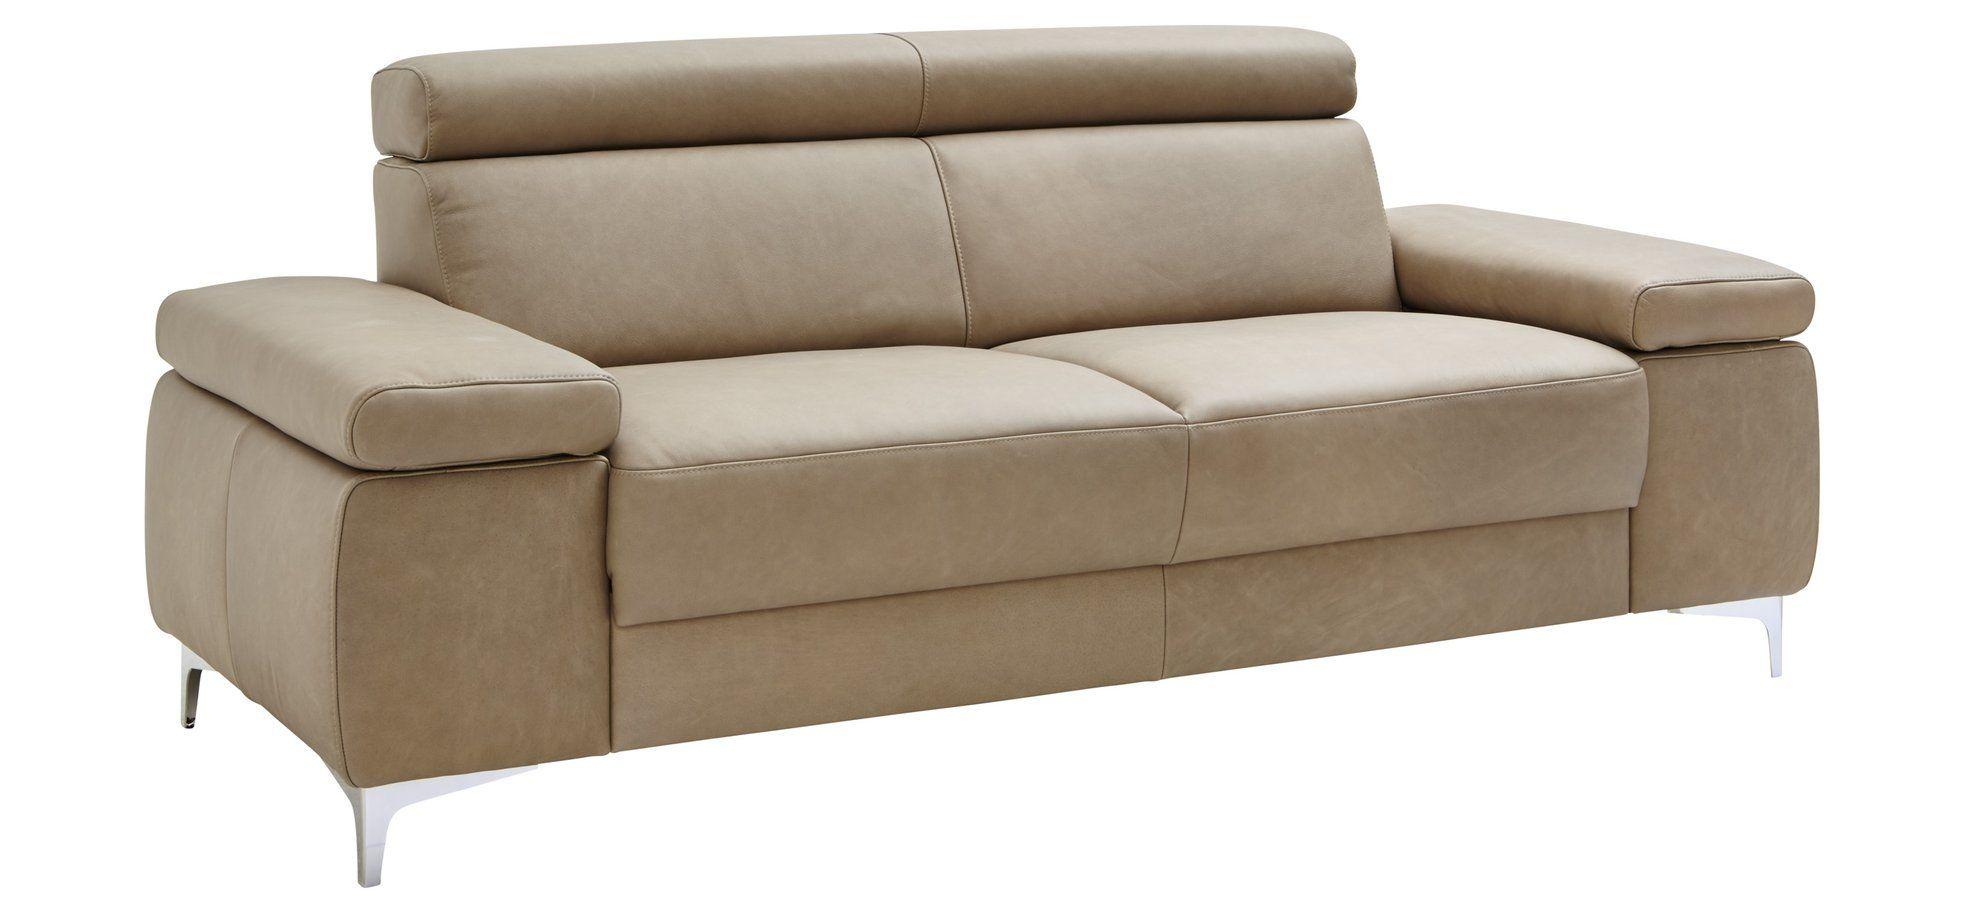 Full Size of Natura Couch Denver Sofa Pasadena Newport Home Livingston Love Brooklyn Kansas Gebraucht Kaufen Pin Von Mbel Lenz Gmbh Co Kg Auf Sofas Stoff Grau Leinen Sofa Natura Sofa